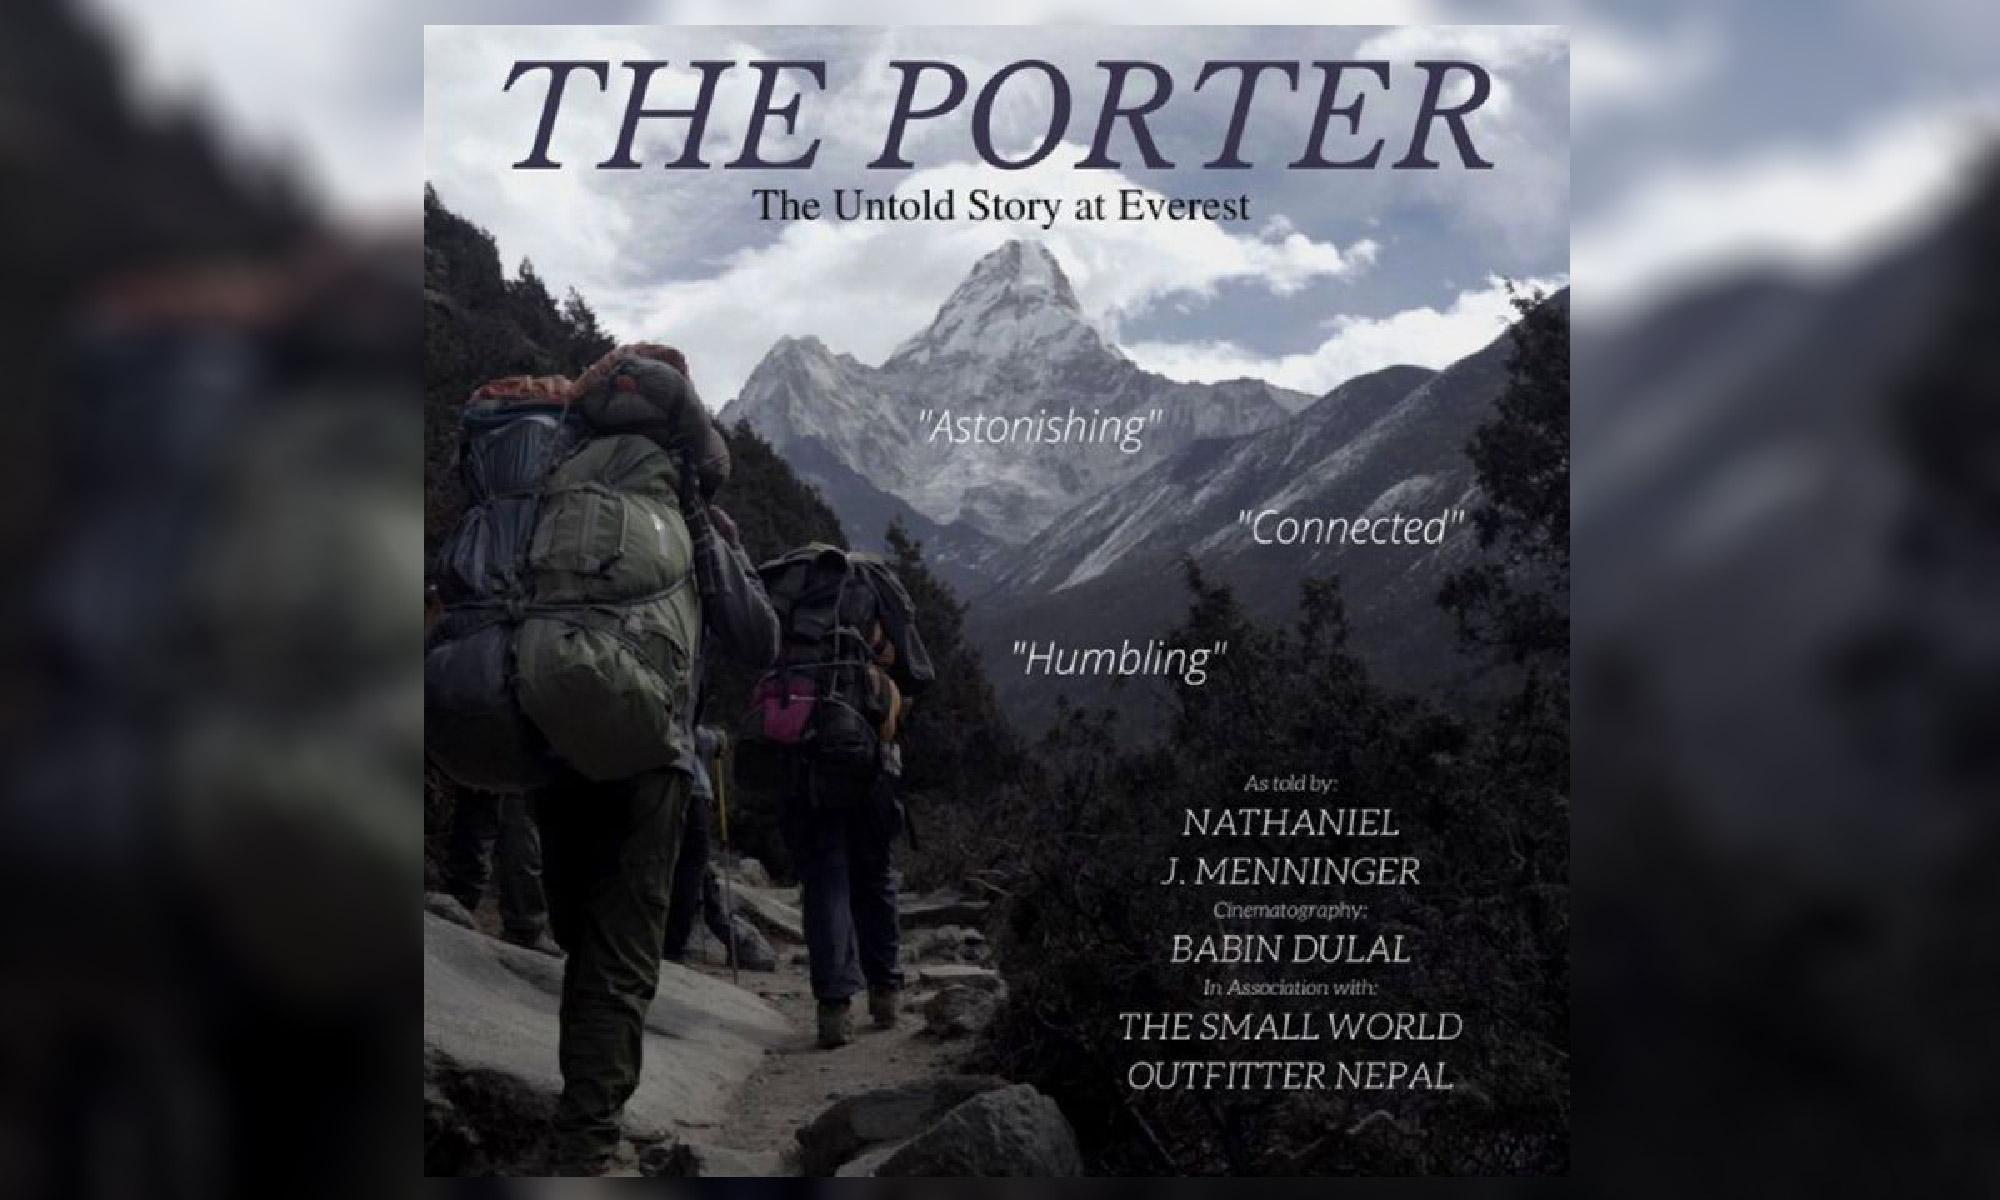 The Porter